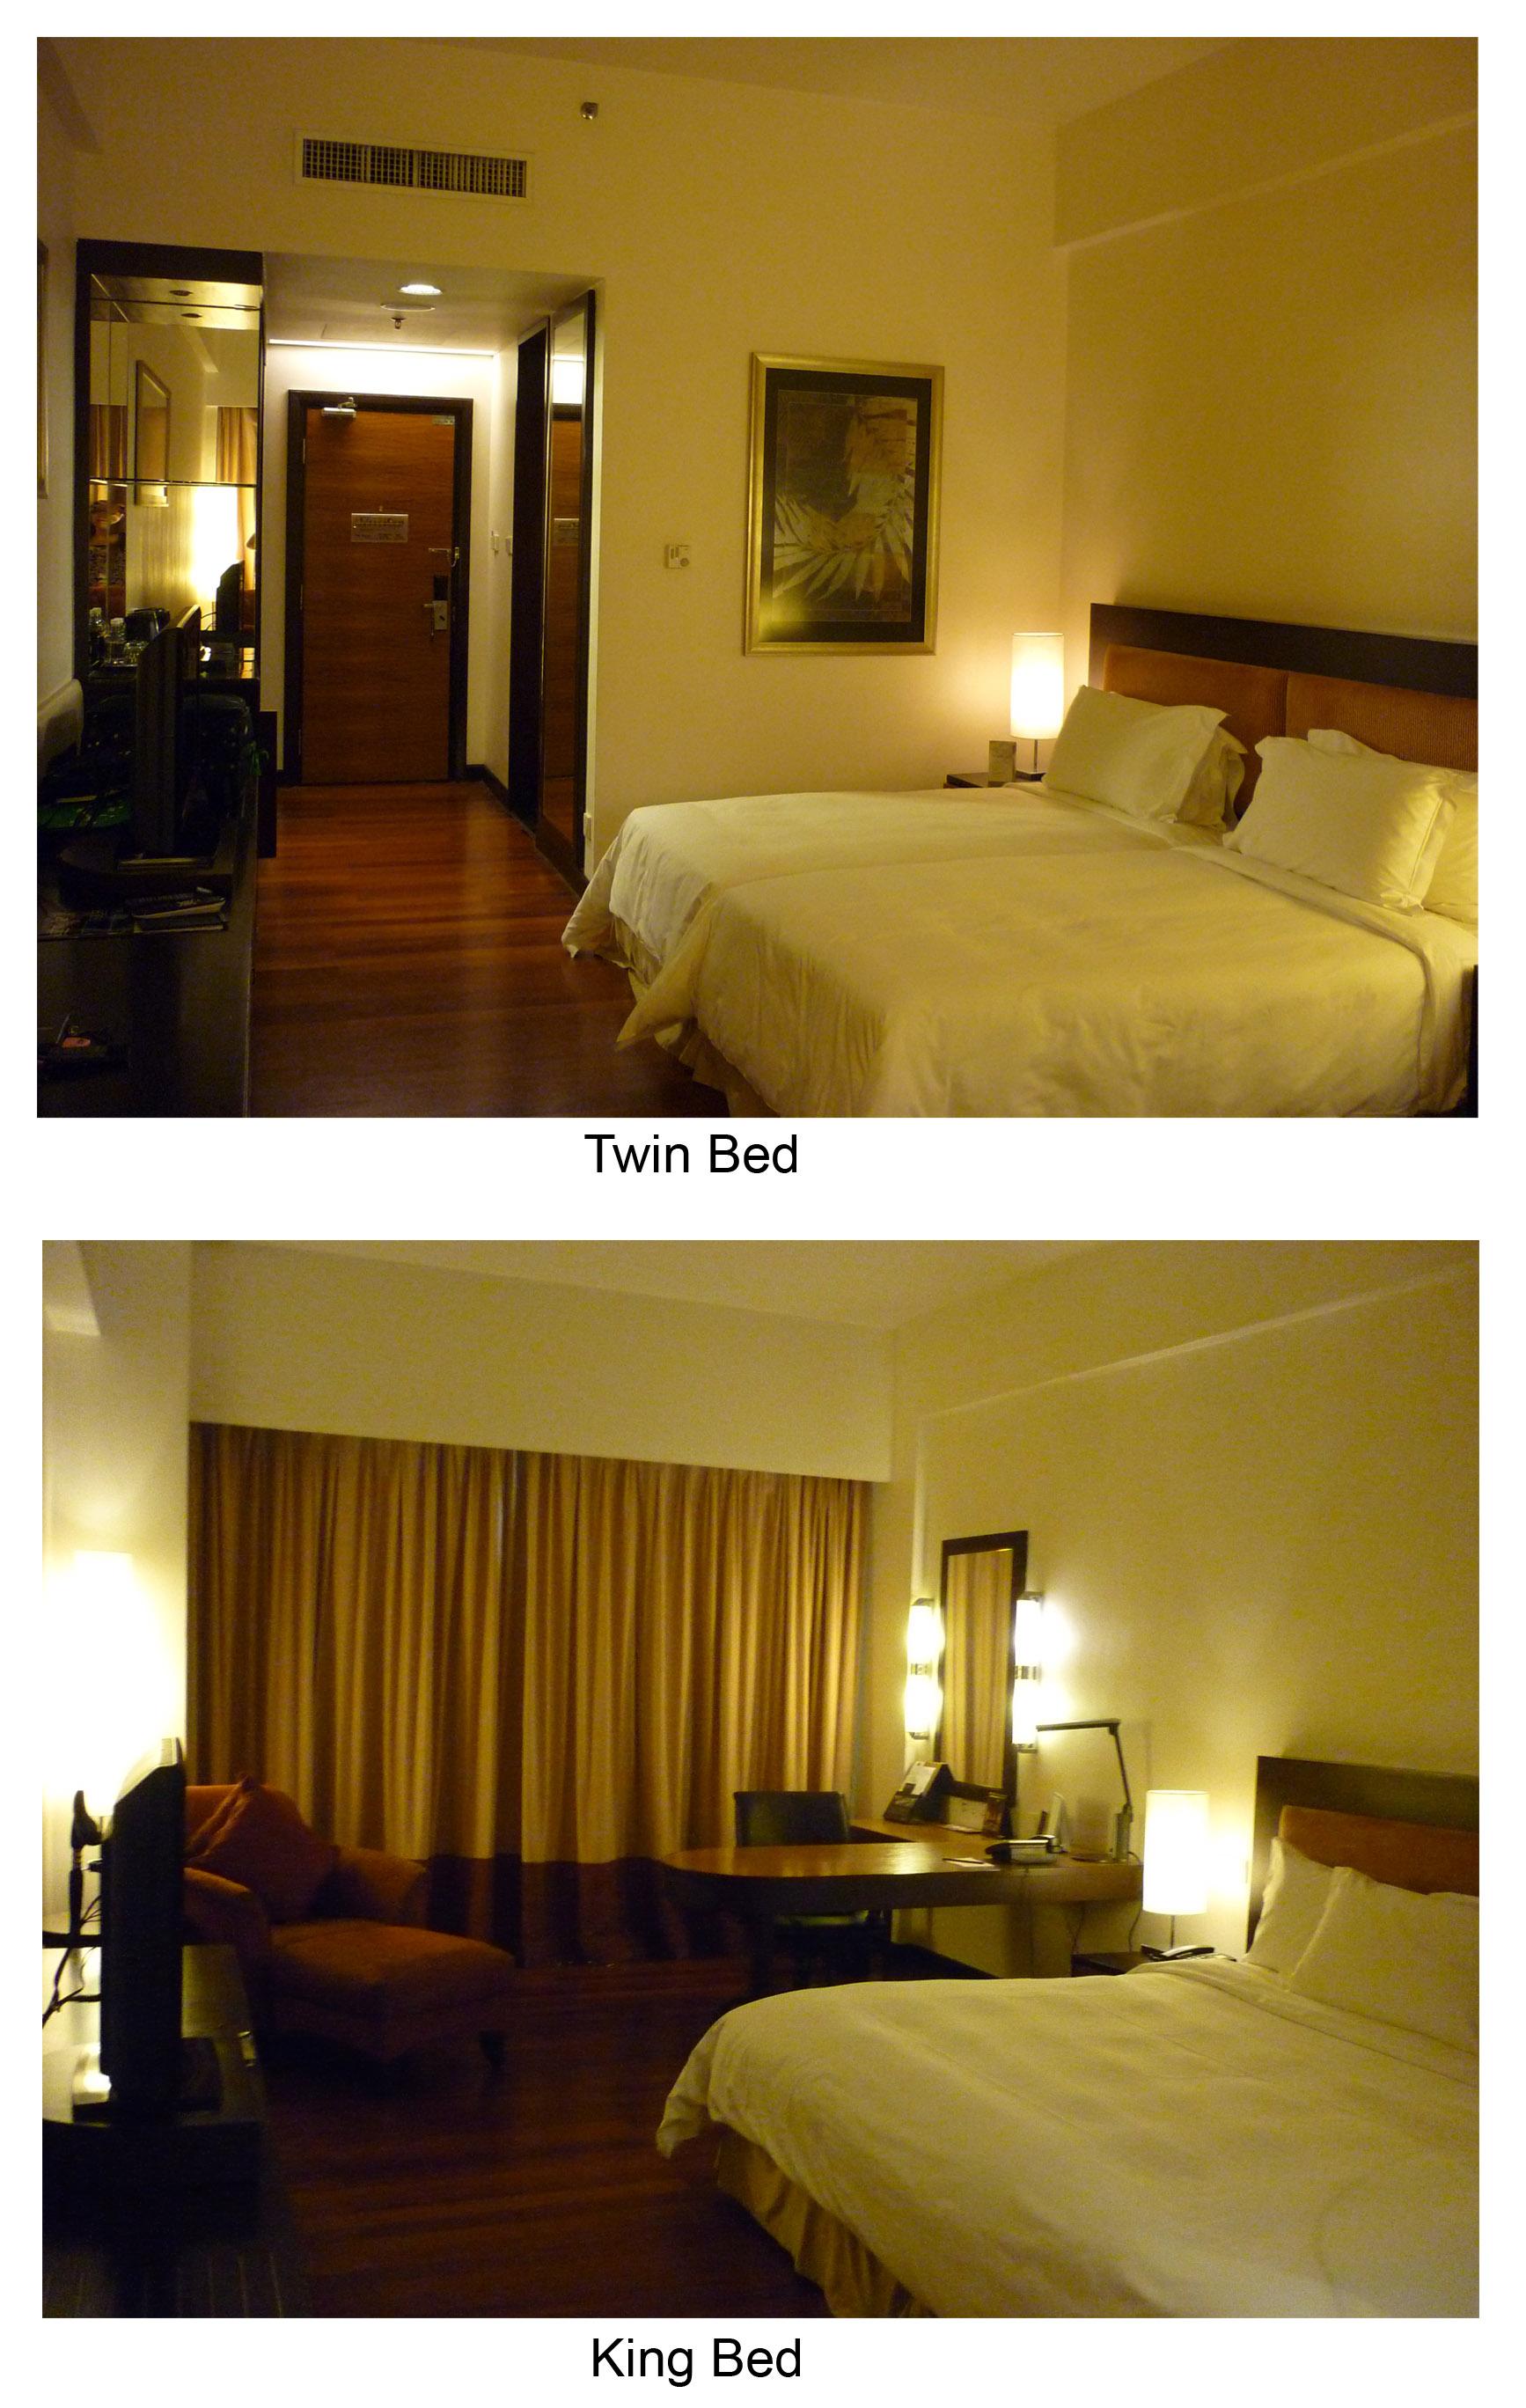 Twin Bed Hotel Room: IMPIANA KLCC HOTEL, Kuala Lumpur (Comparison Between